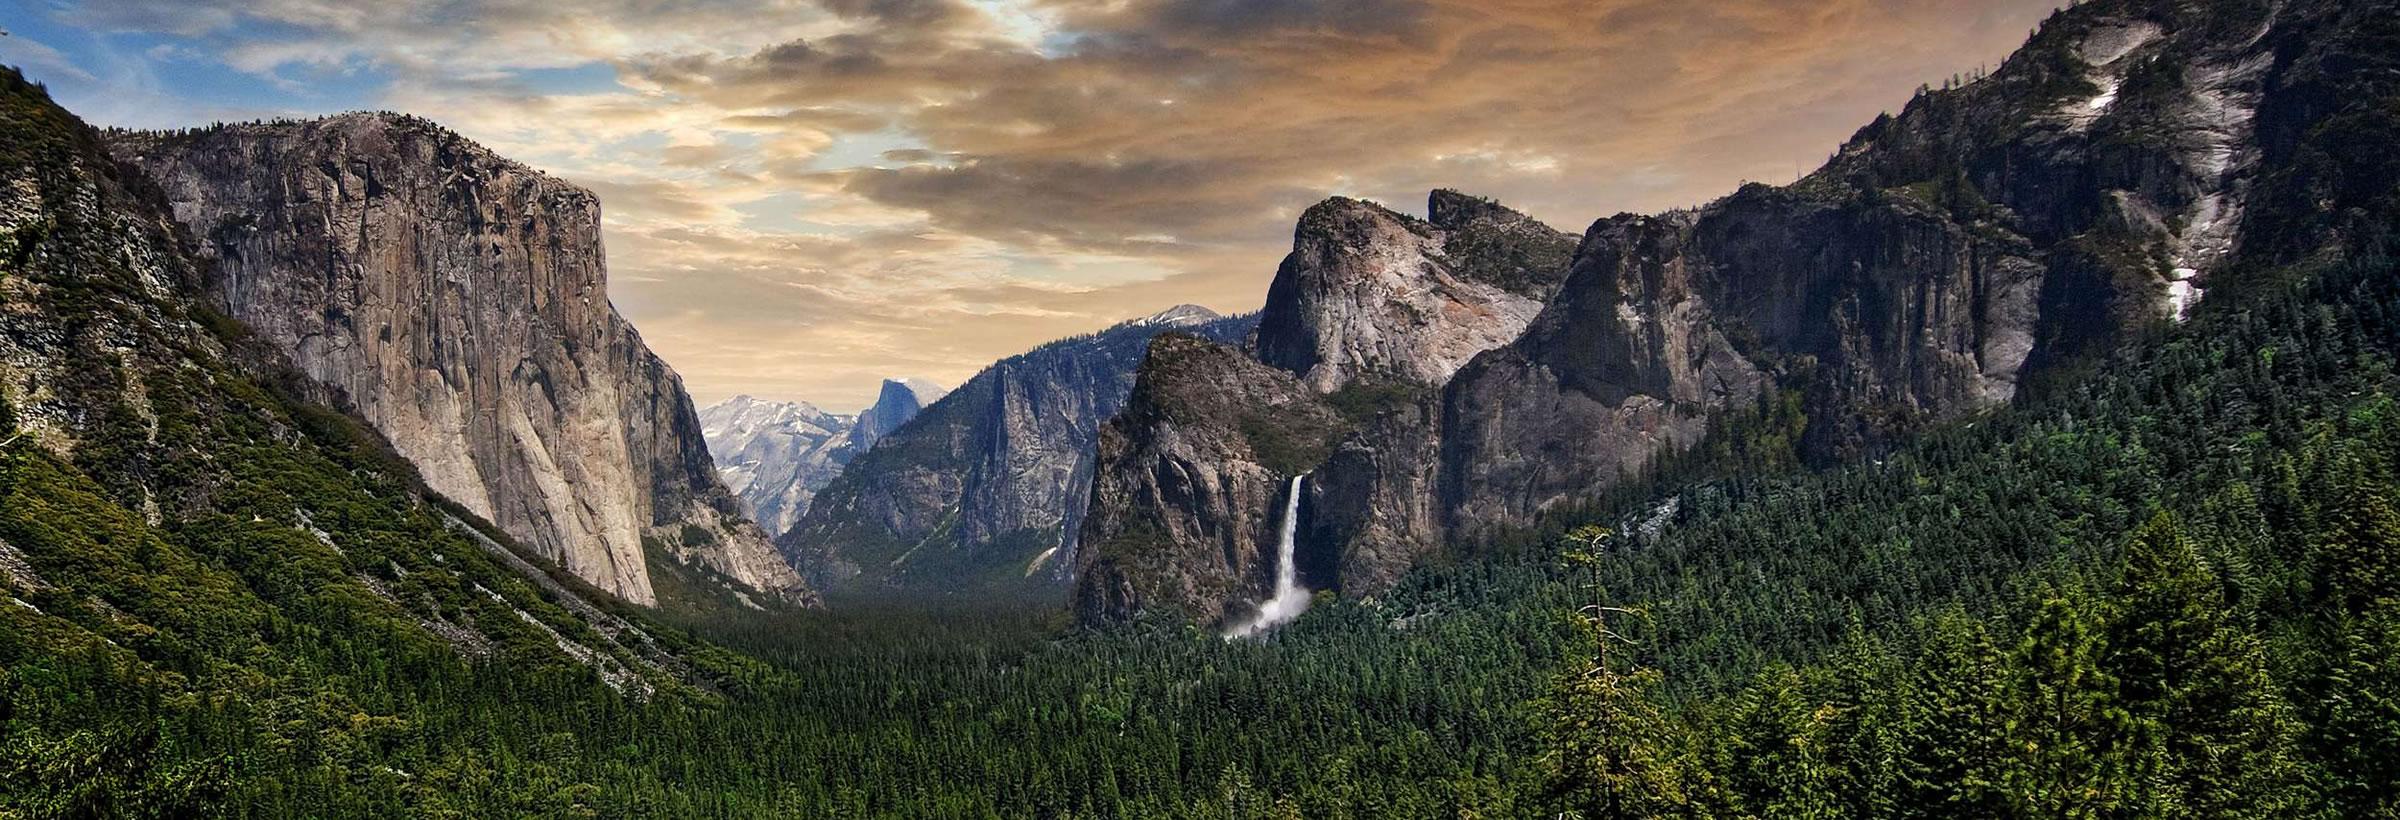 california-natl-parks